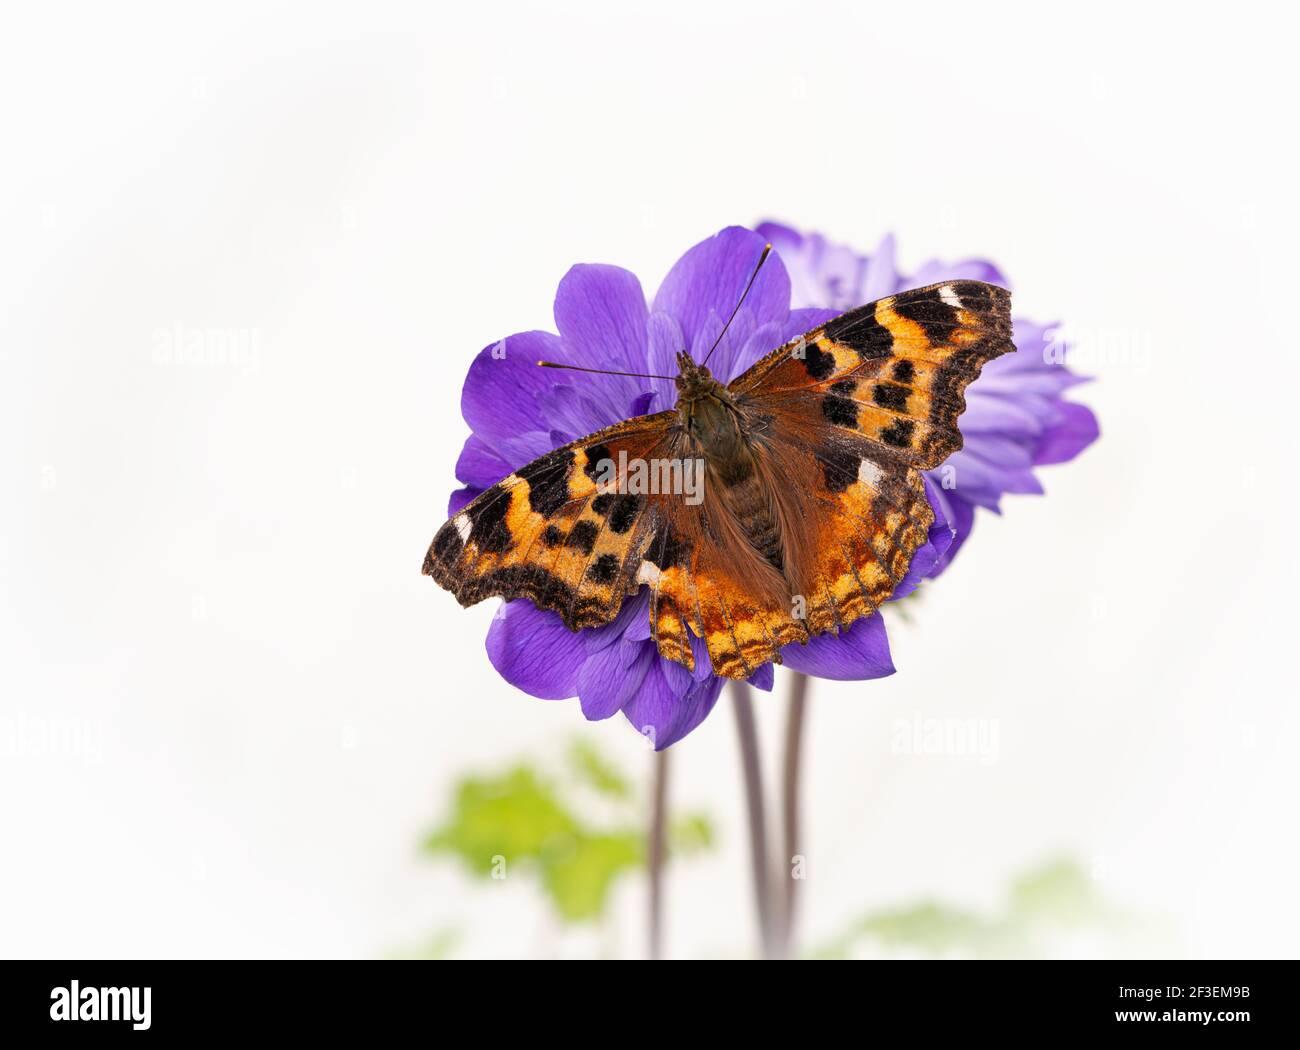 Macro de una mariposa de tortoiseshell descansando sobre una flor de anémona púrpura, sobre un fondo floral blanco Foto de stock